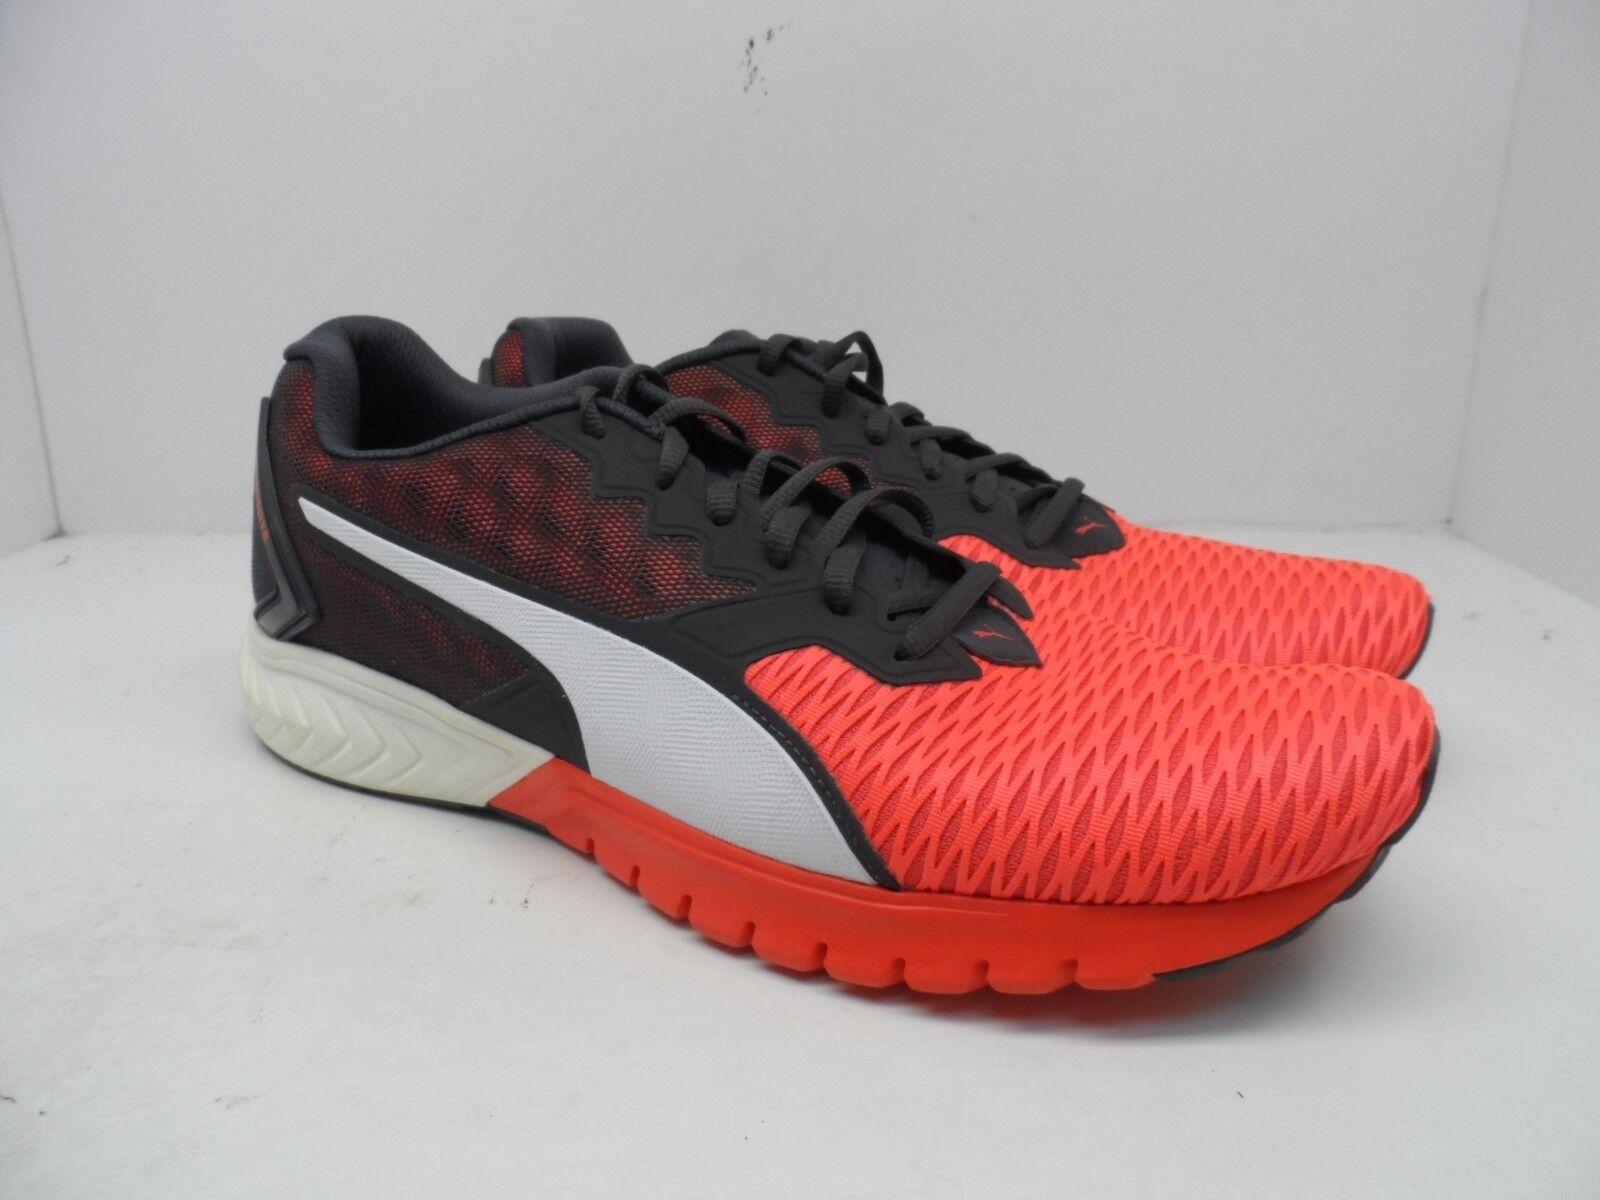 Puma Men's Ignite Dual Athletic Running shoes Red Blast Asphalt Size 12M